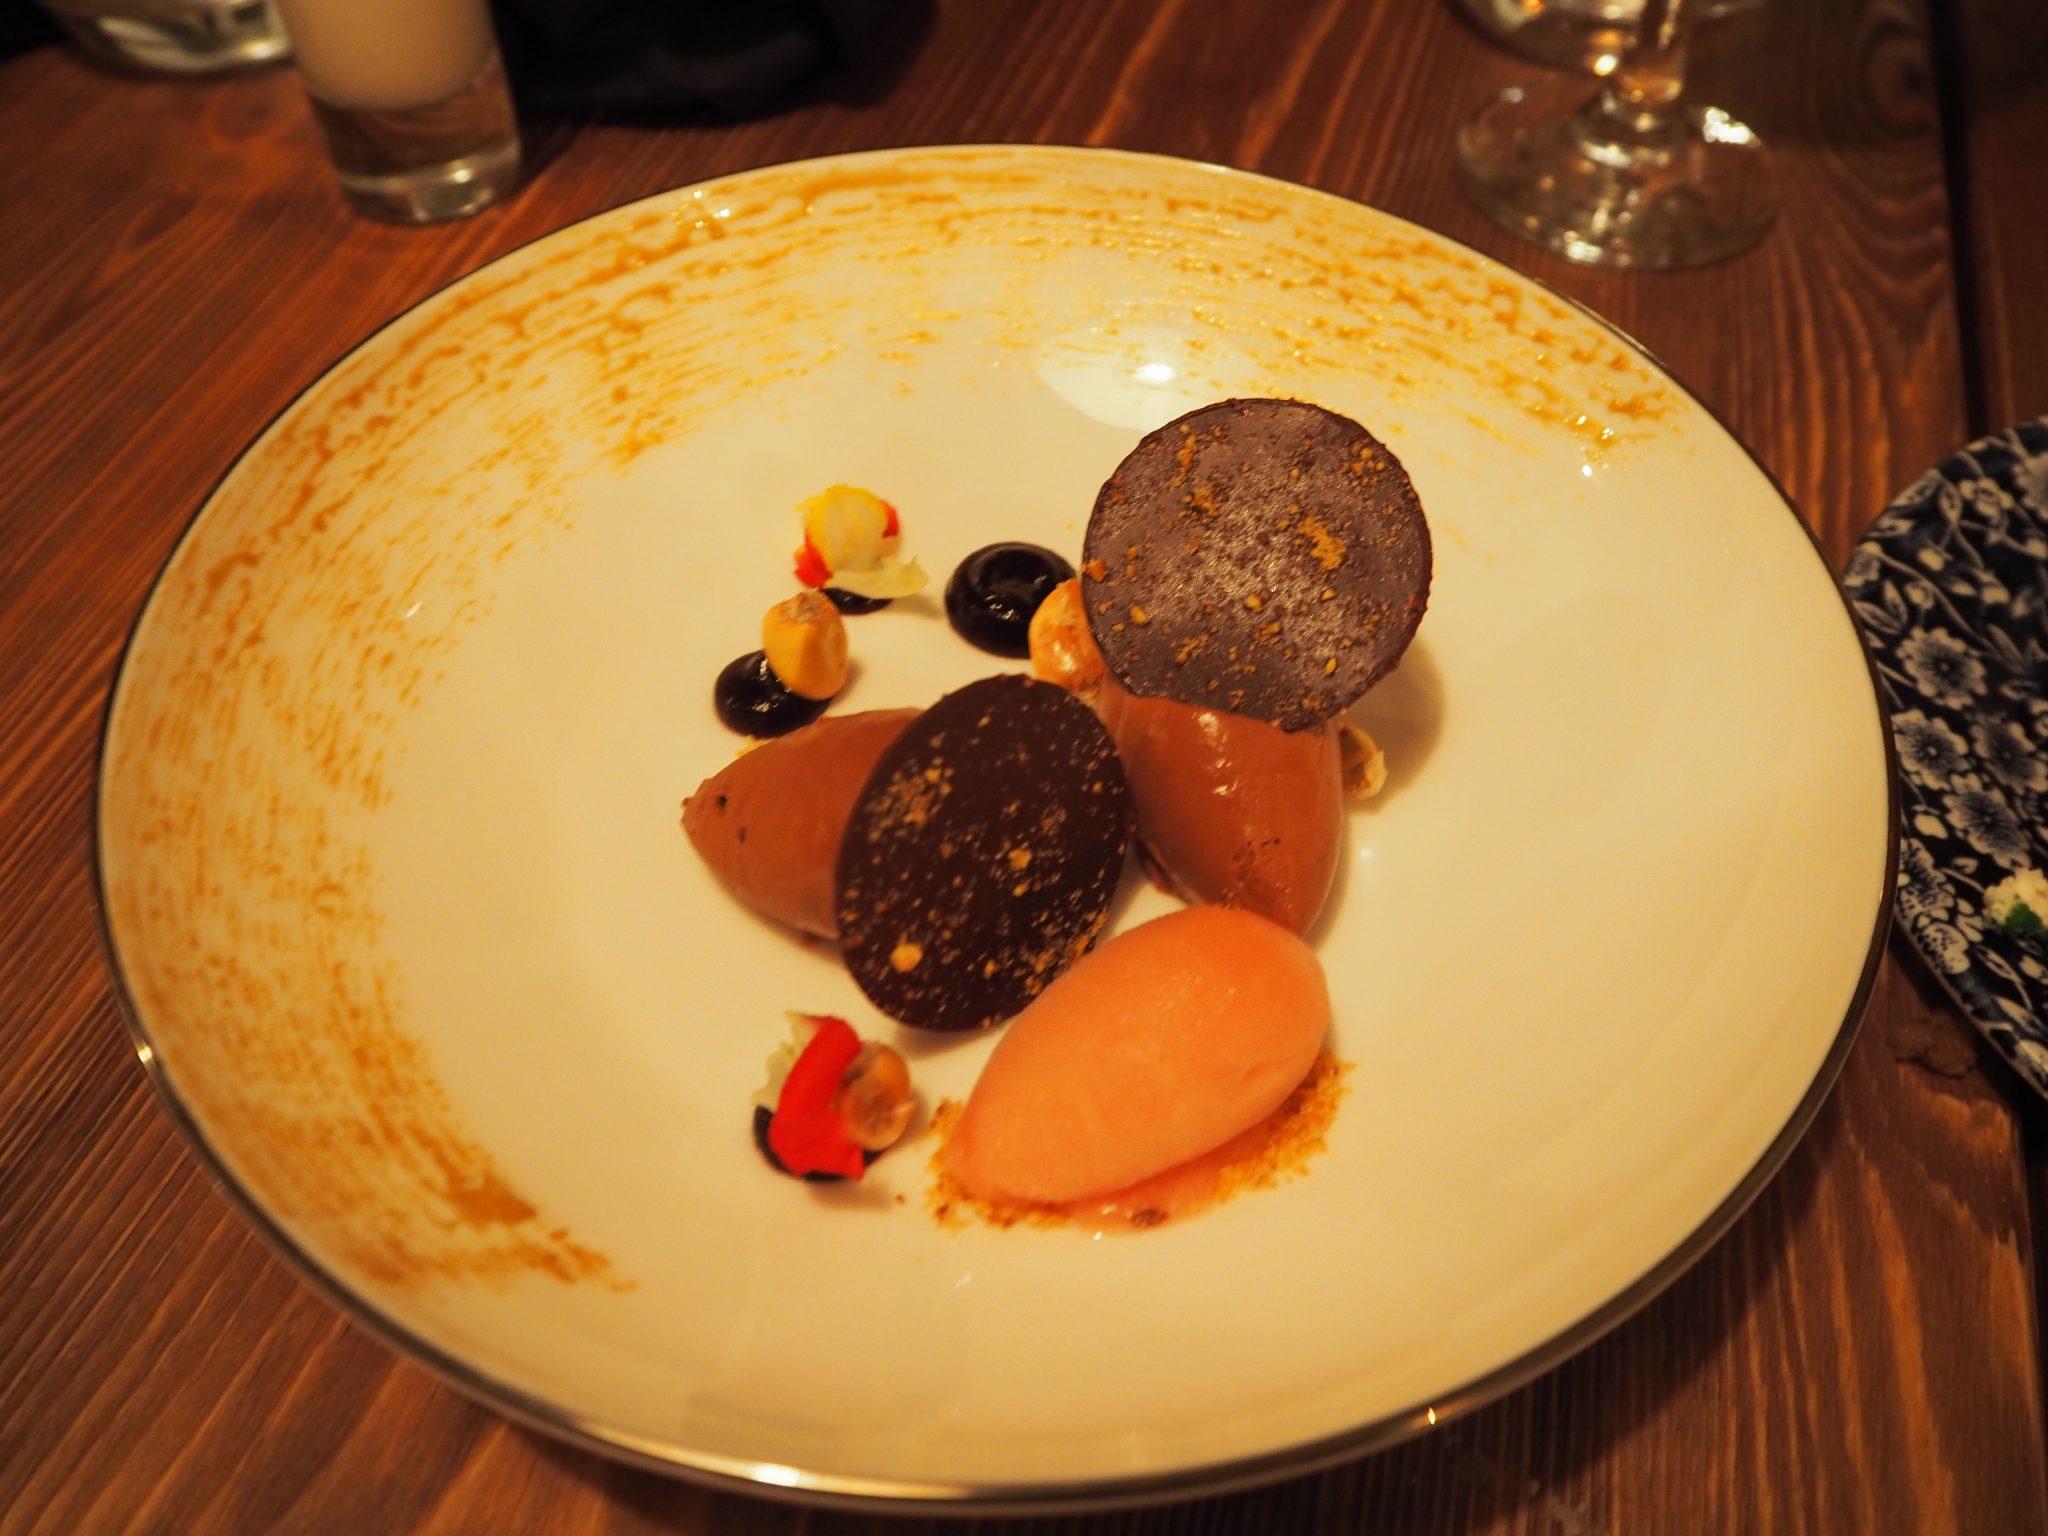 The Inca chocolat with kikos, guava sorbet and pisco sour / Le chocolat Inca Péruvien avec kikos, guava et sorbet au pisco aigre